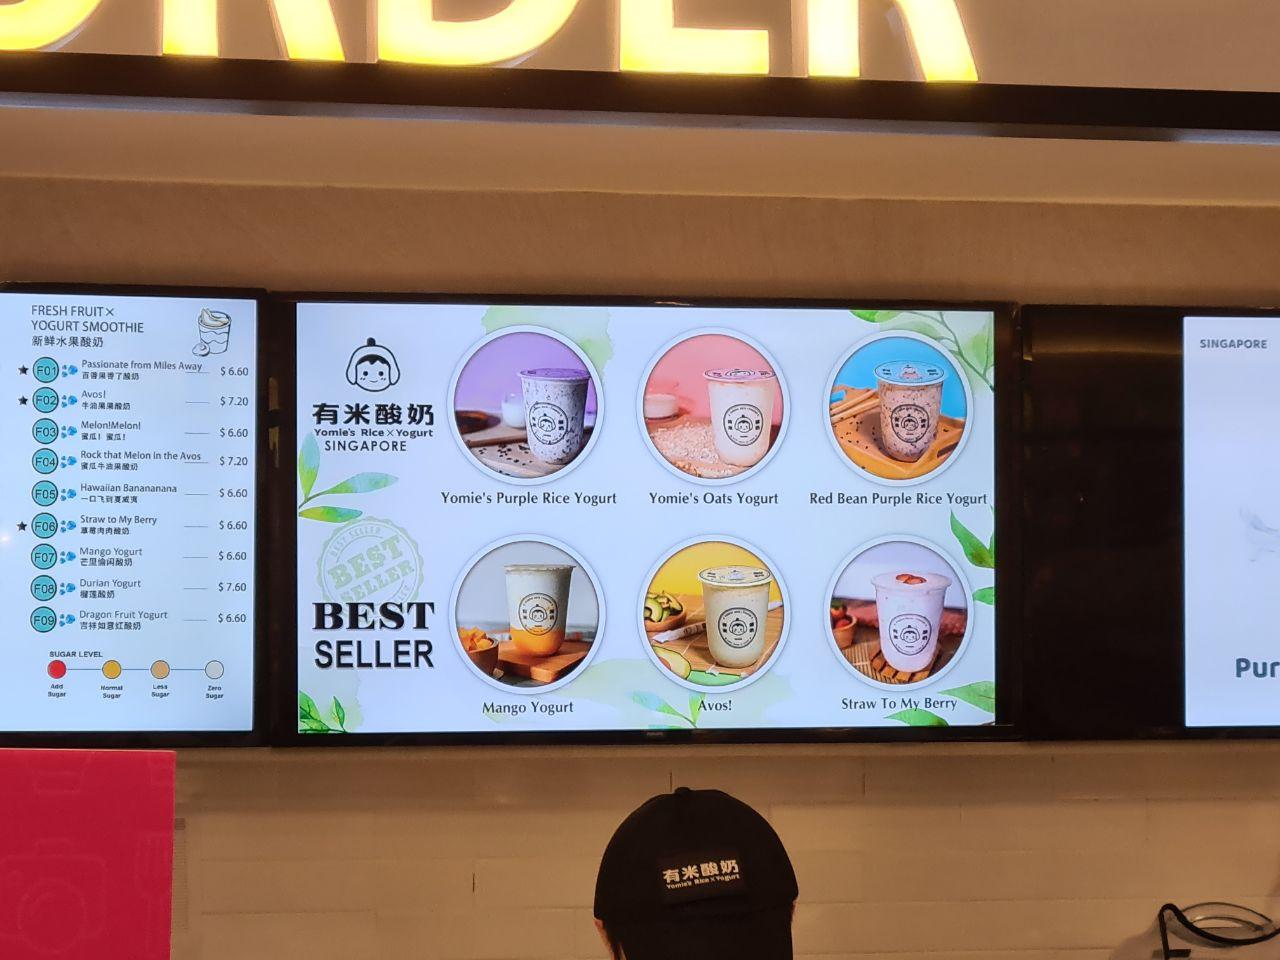 yomie rice yoghurt menu 2